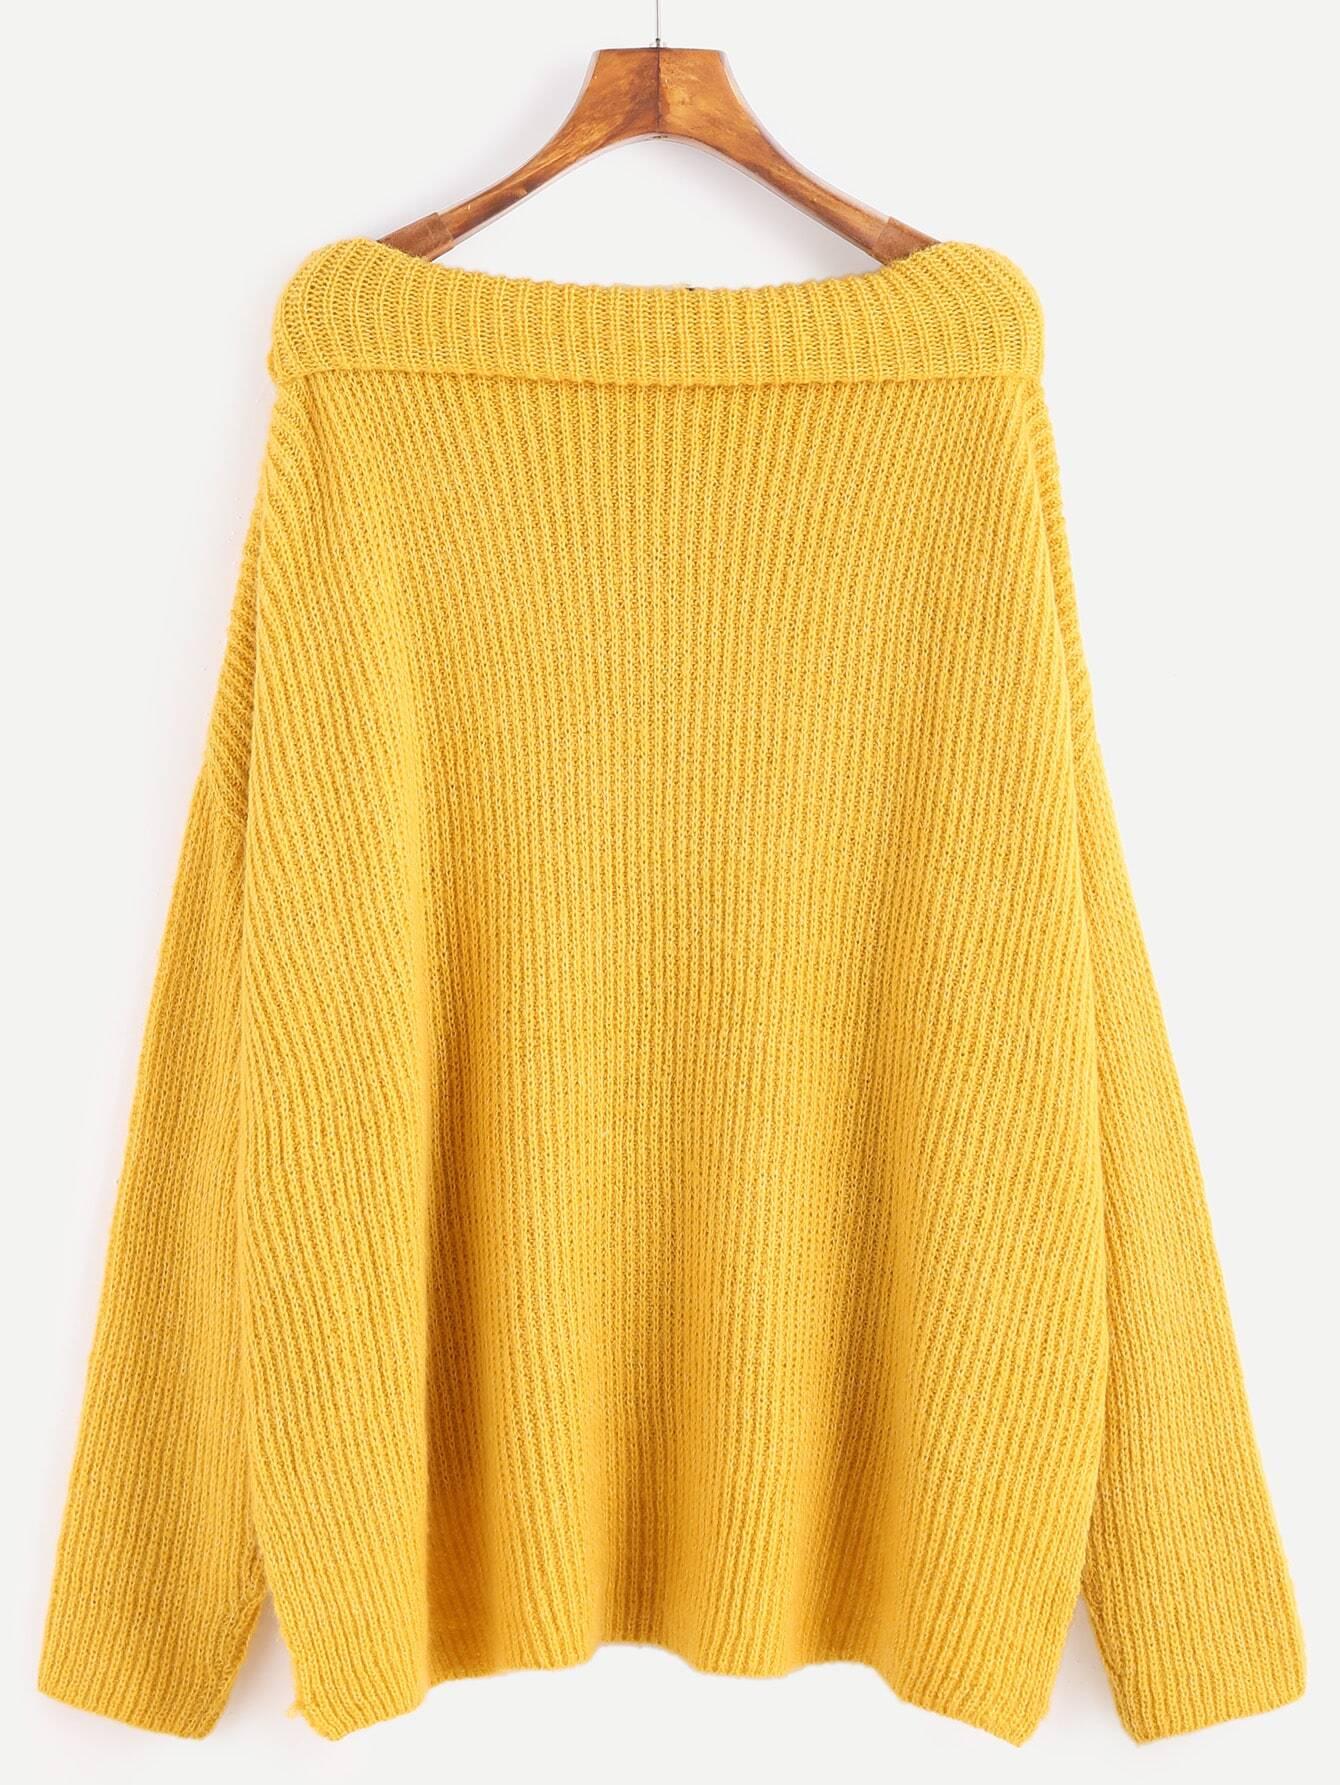 sweater161117450_2